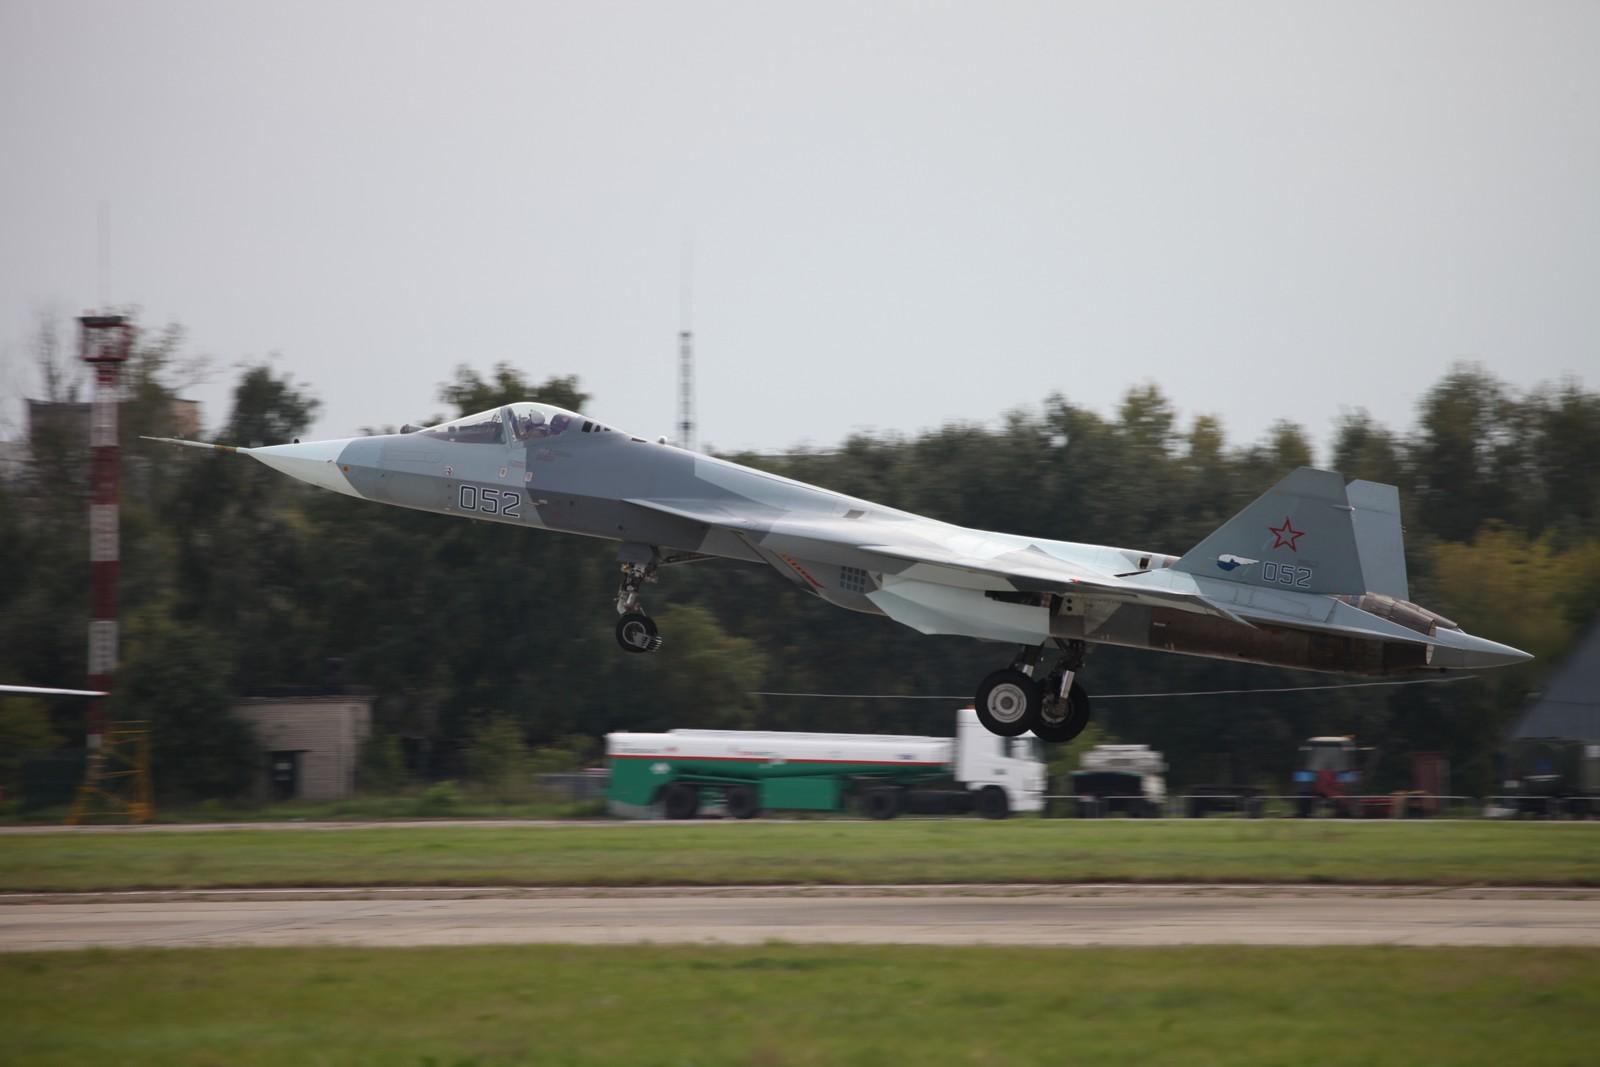 FGFA의 기술 이전에 대한 불화설을 일축한 러시아